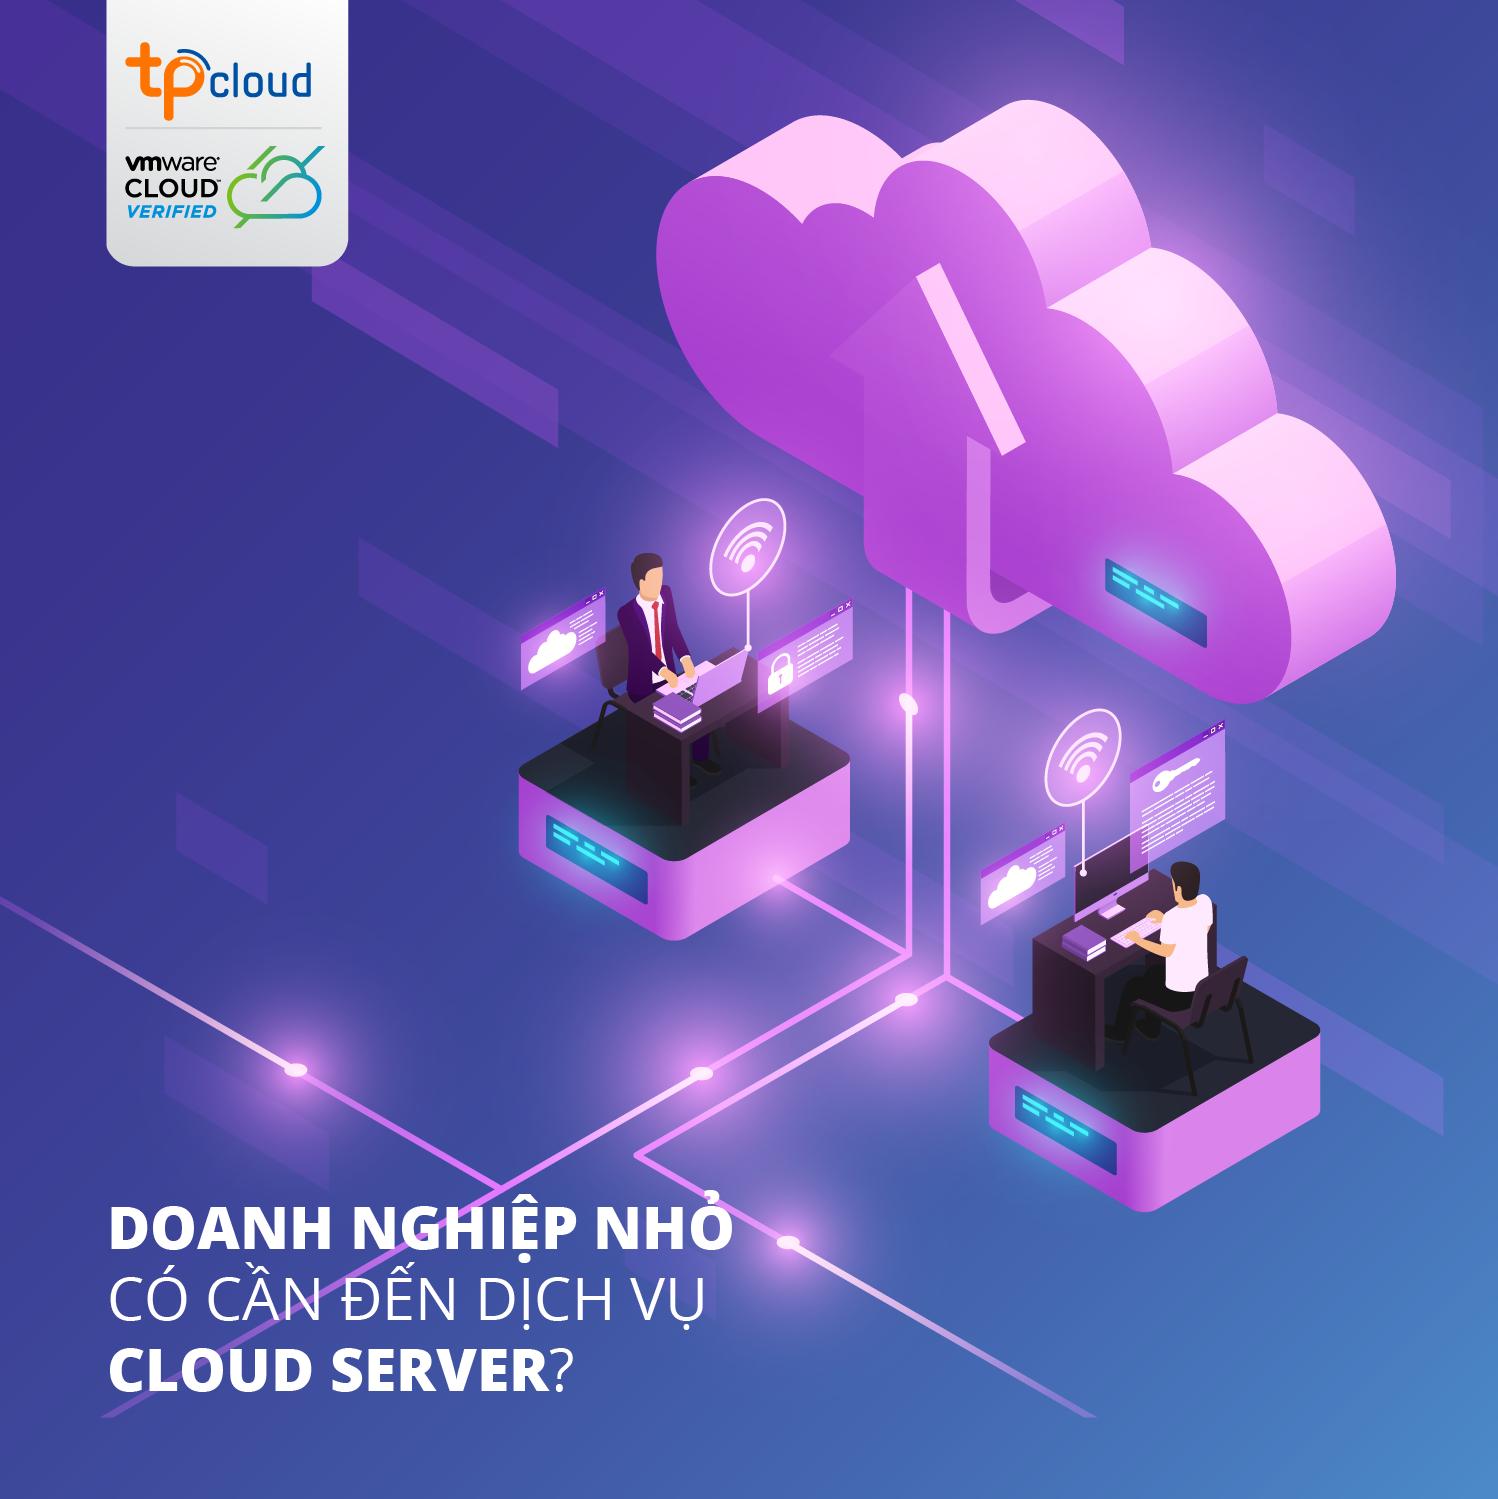 doanh-nghiep-nho-co-can-den-dich-vu-cloud-server